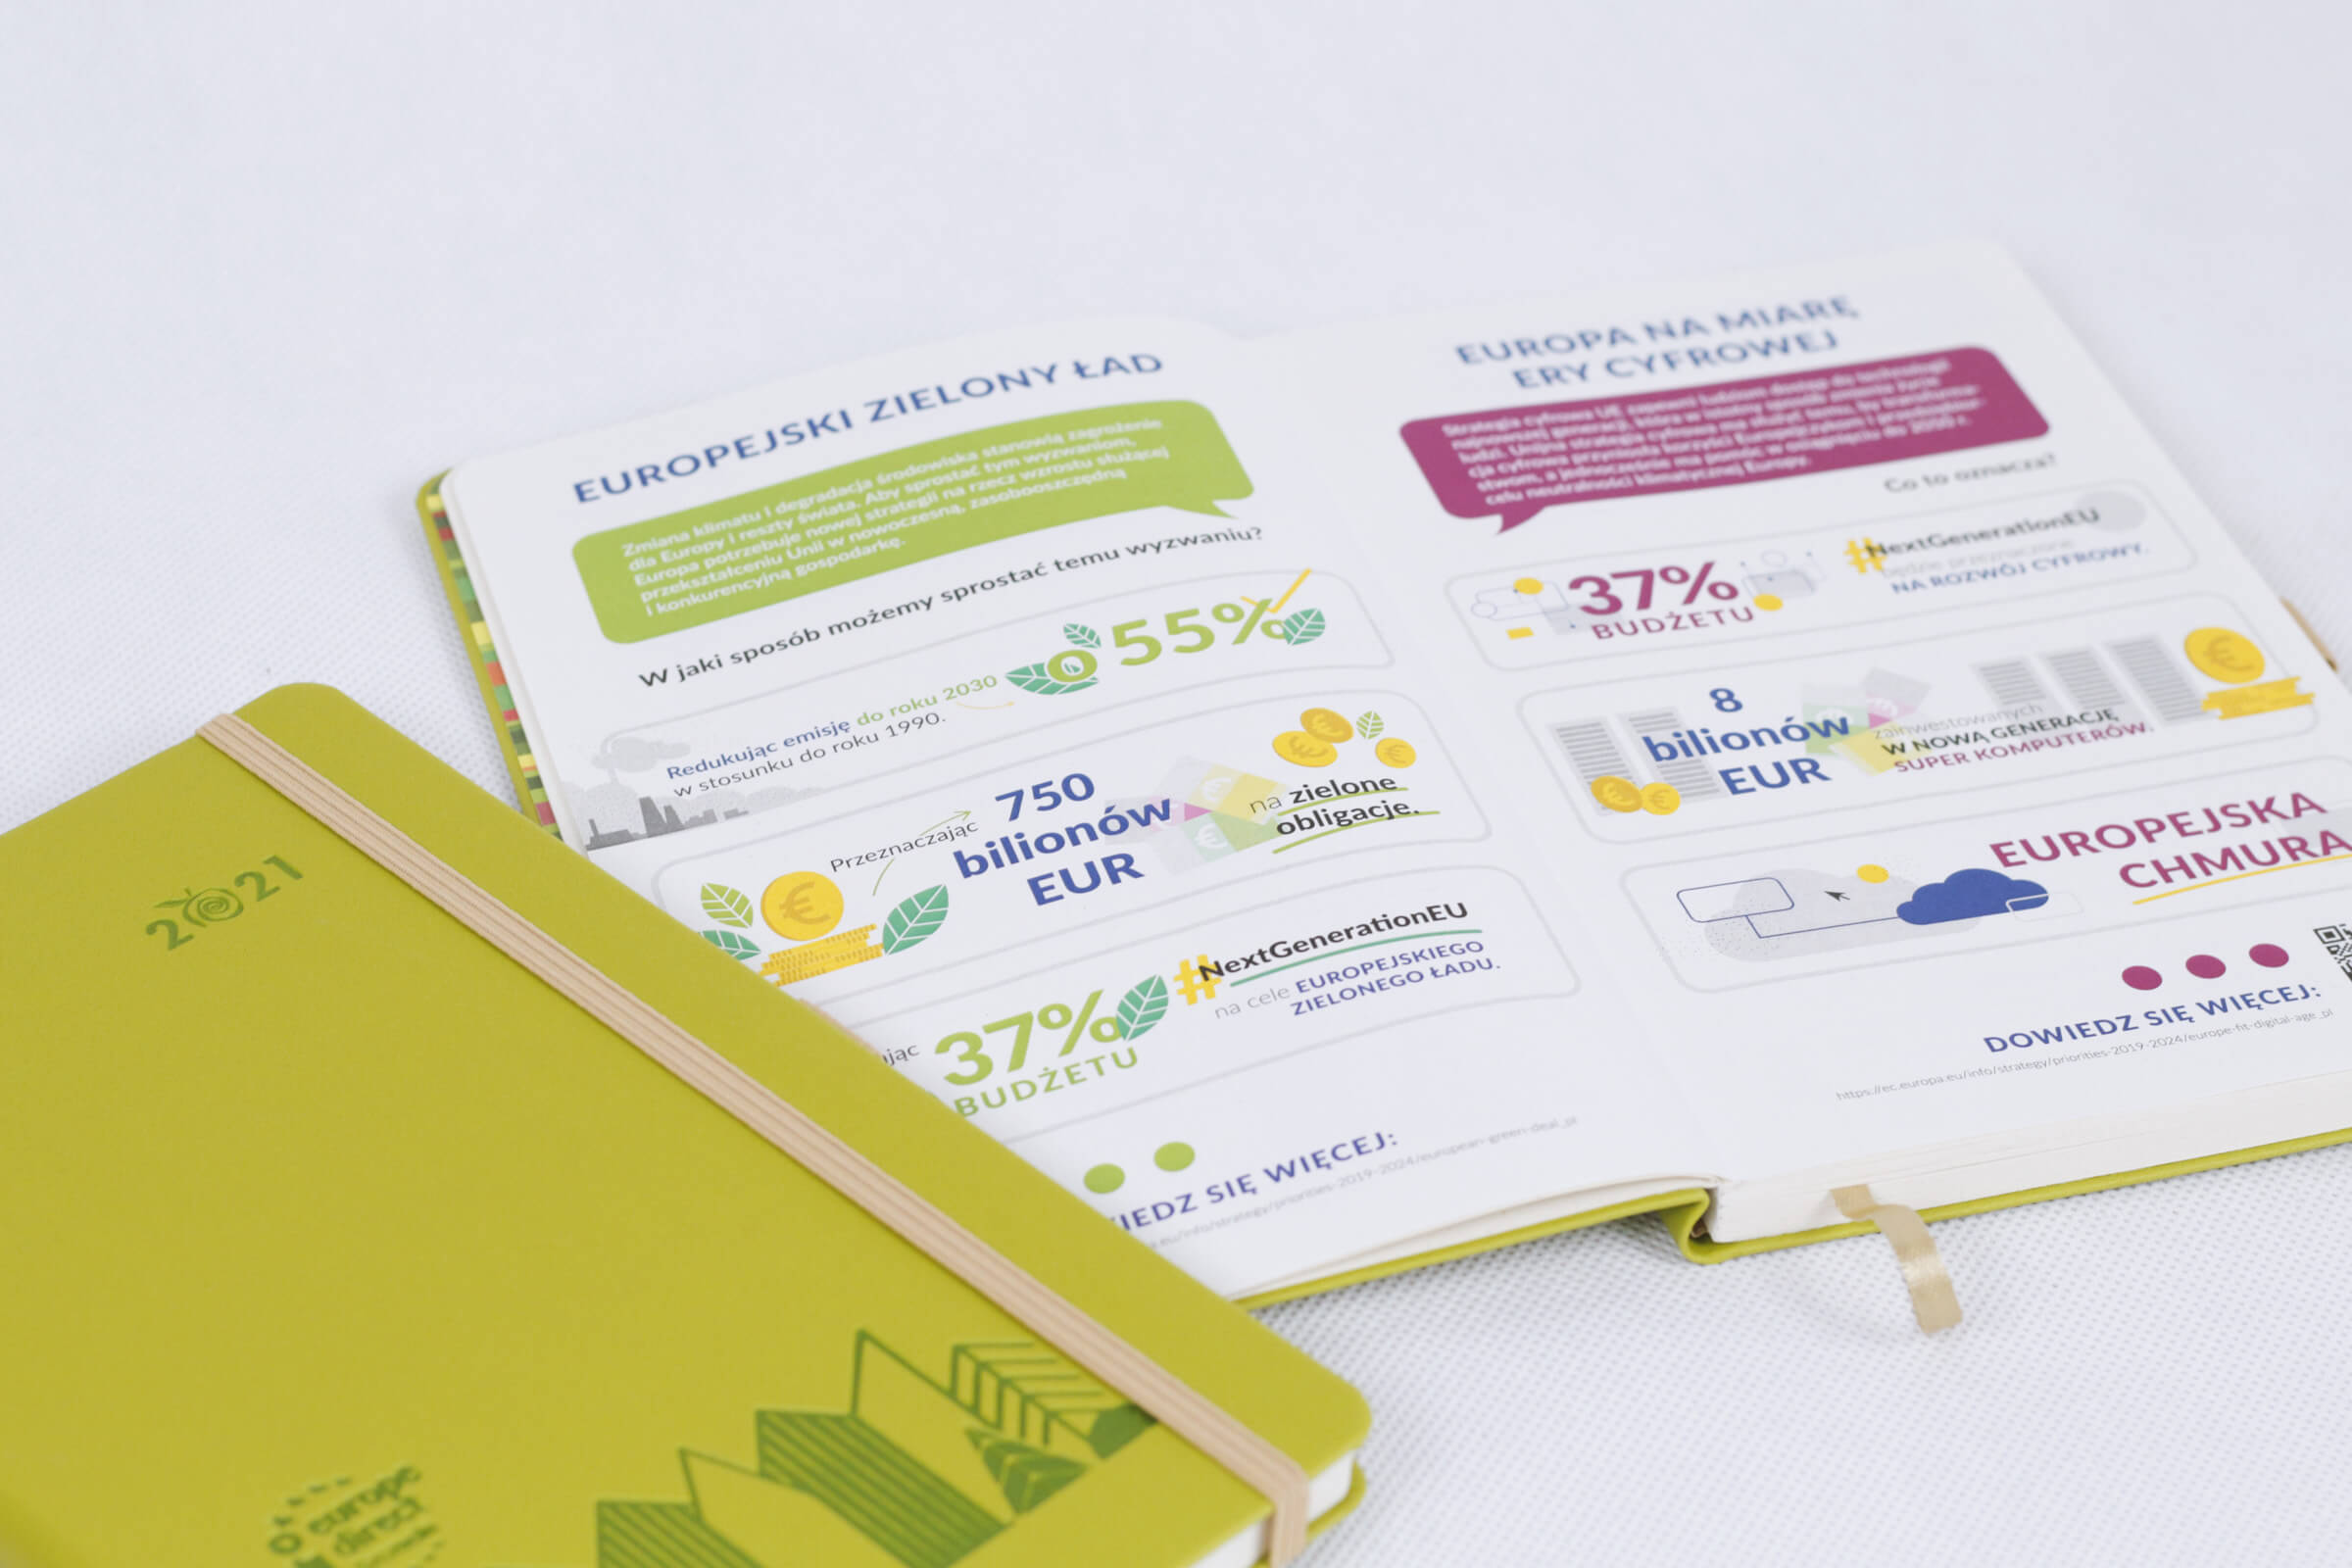 Kalendarz projekt Zielony Ład